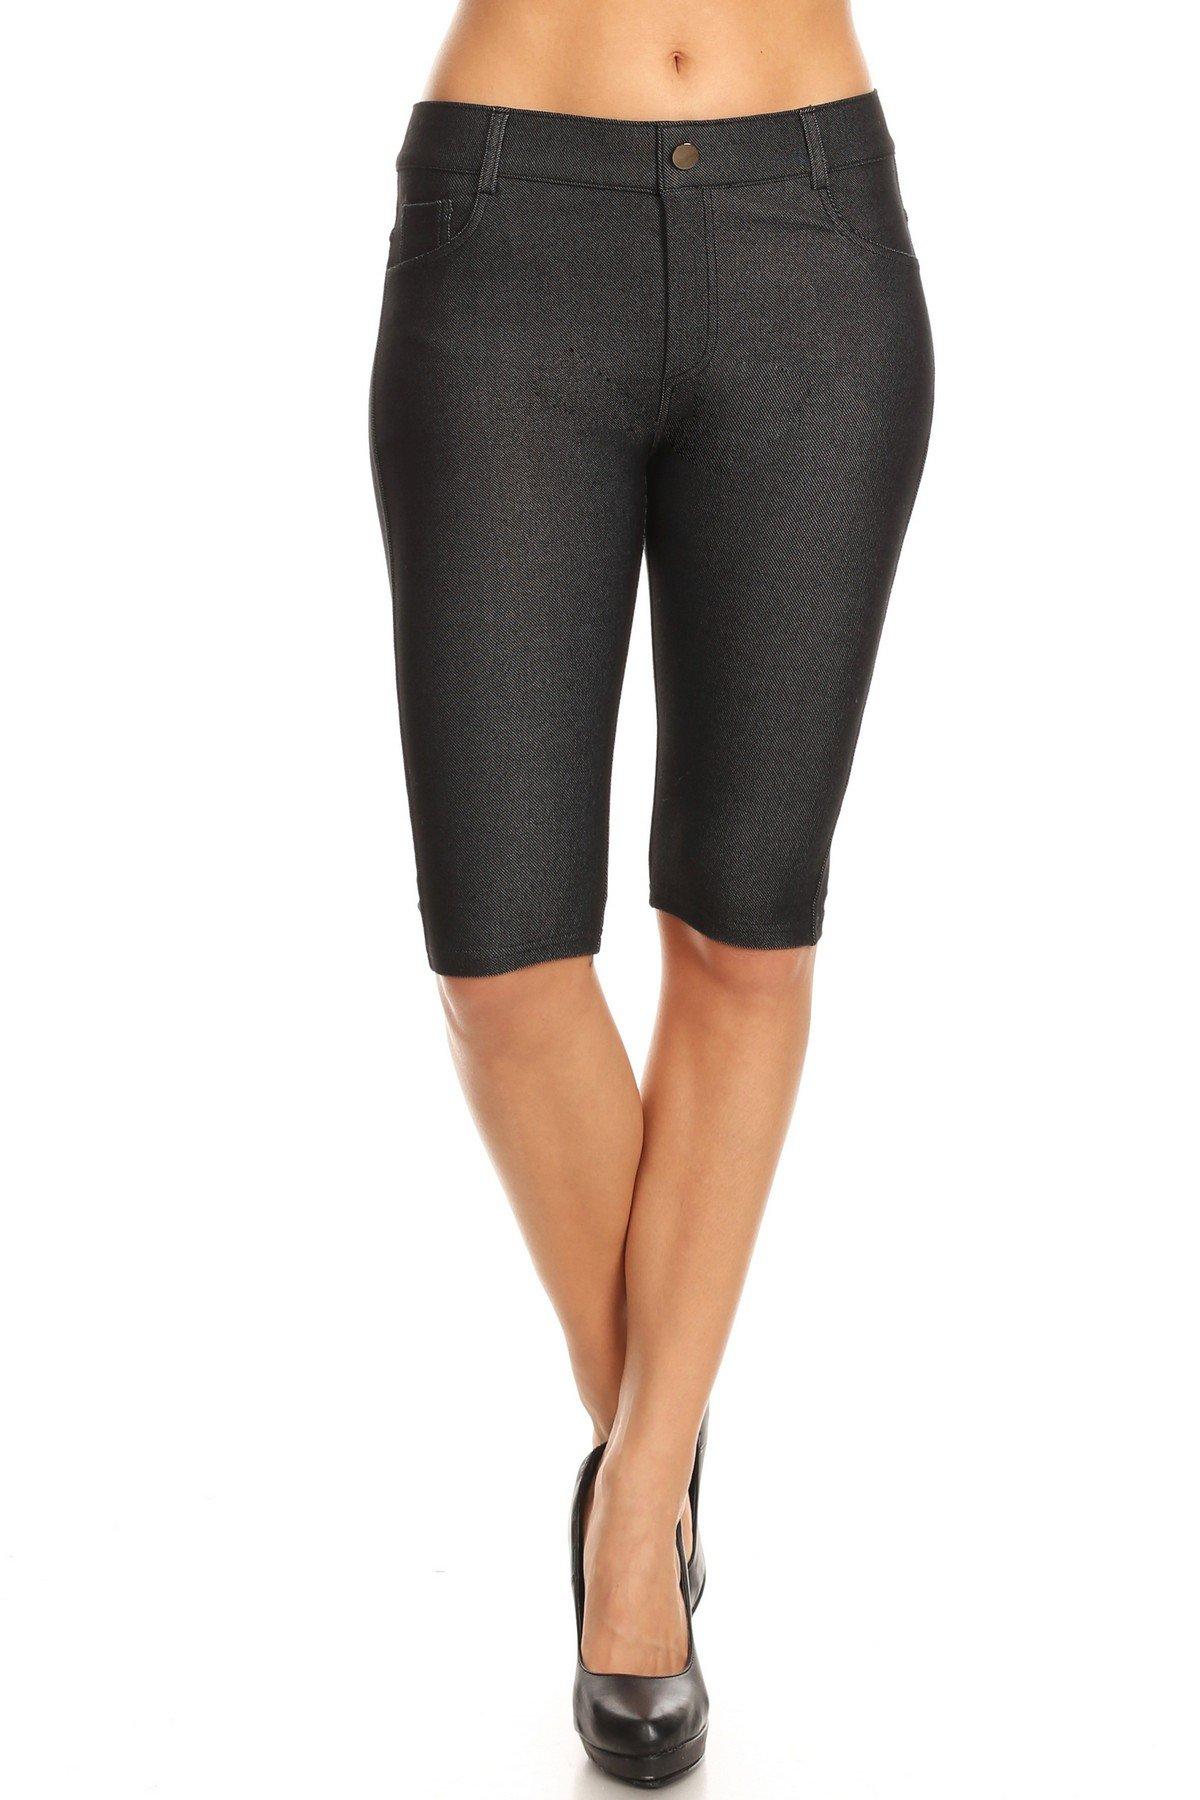 Yelete Women's Classic Bermuda Shorts (Black, Medium)